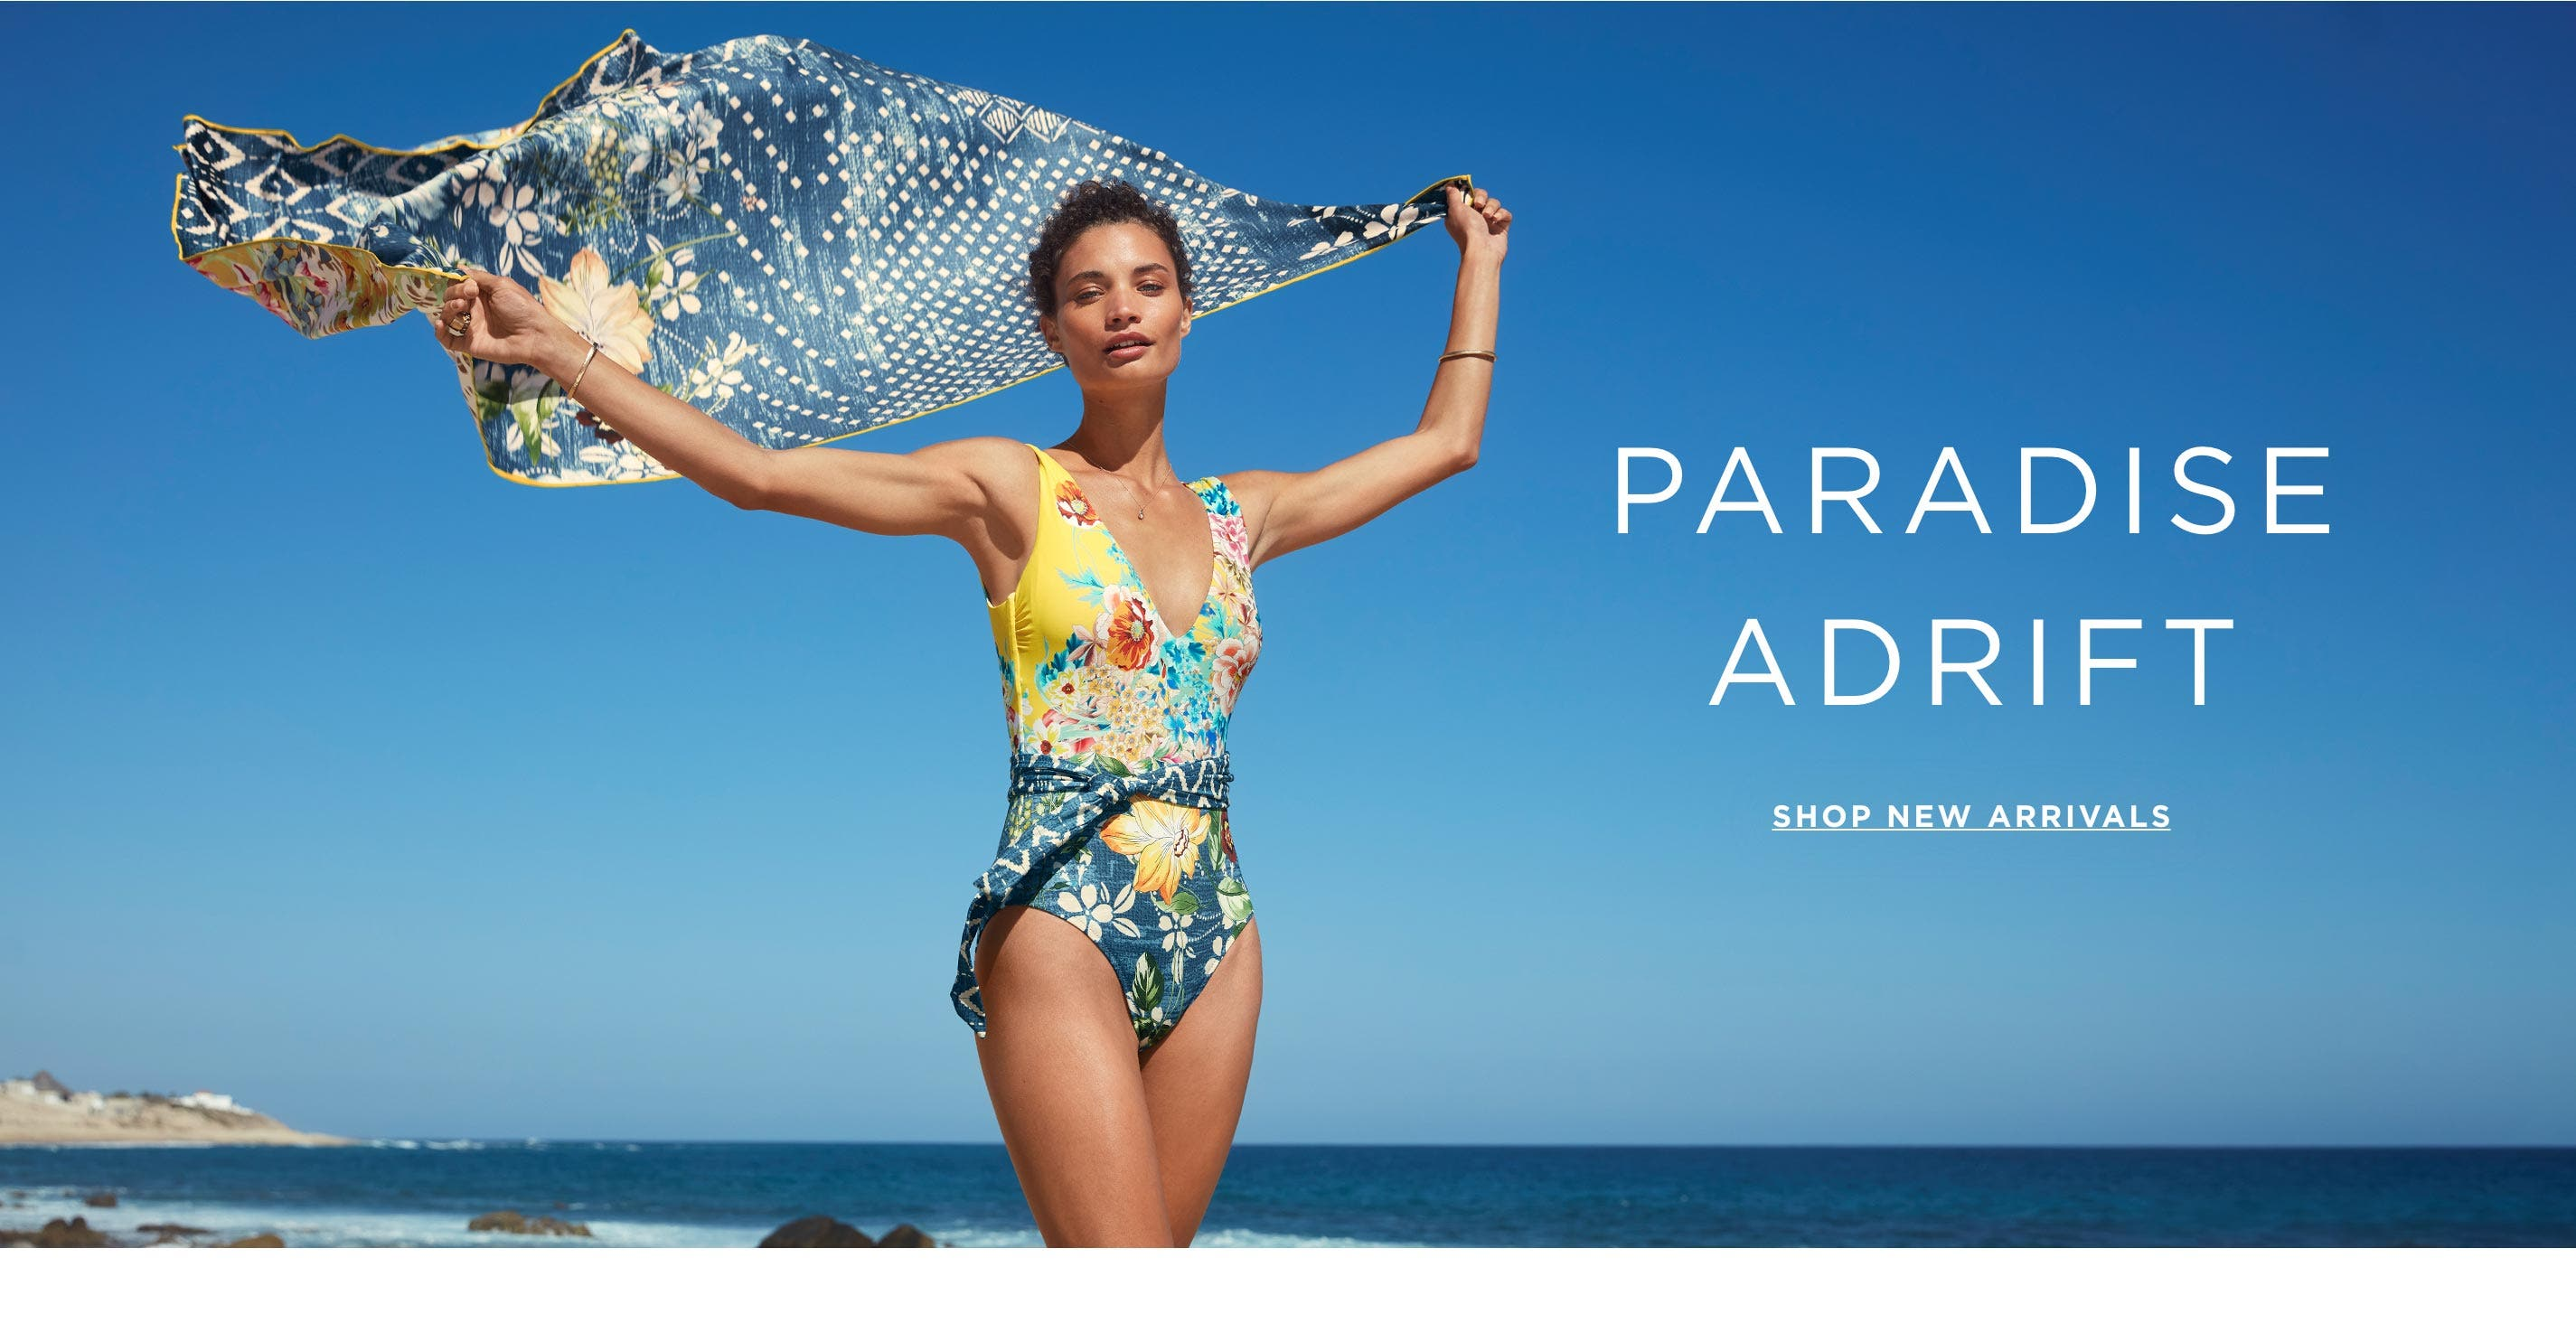 Paradise Adrift – Shop New Arrivals